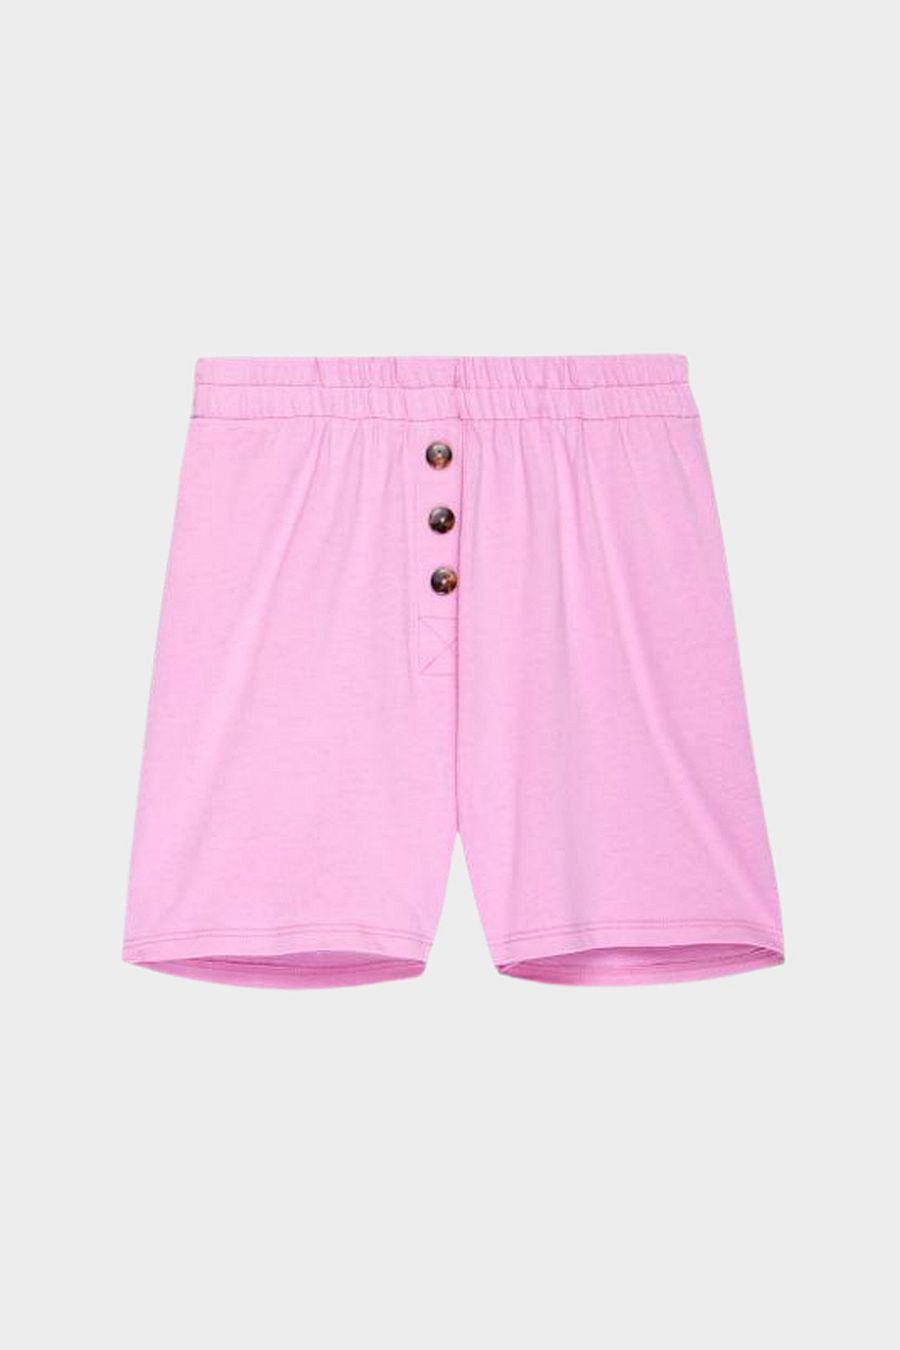 DONNI. Henley Short - Flamingo